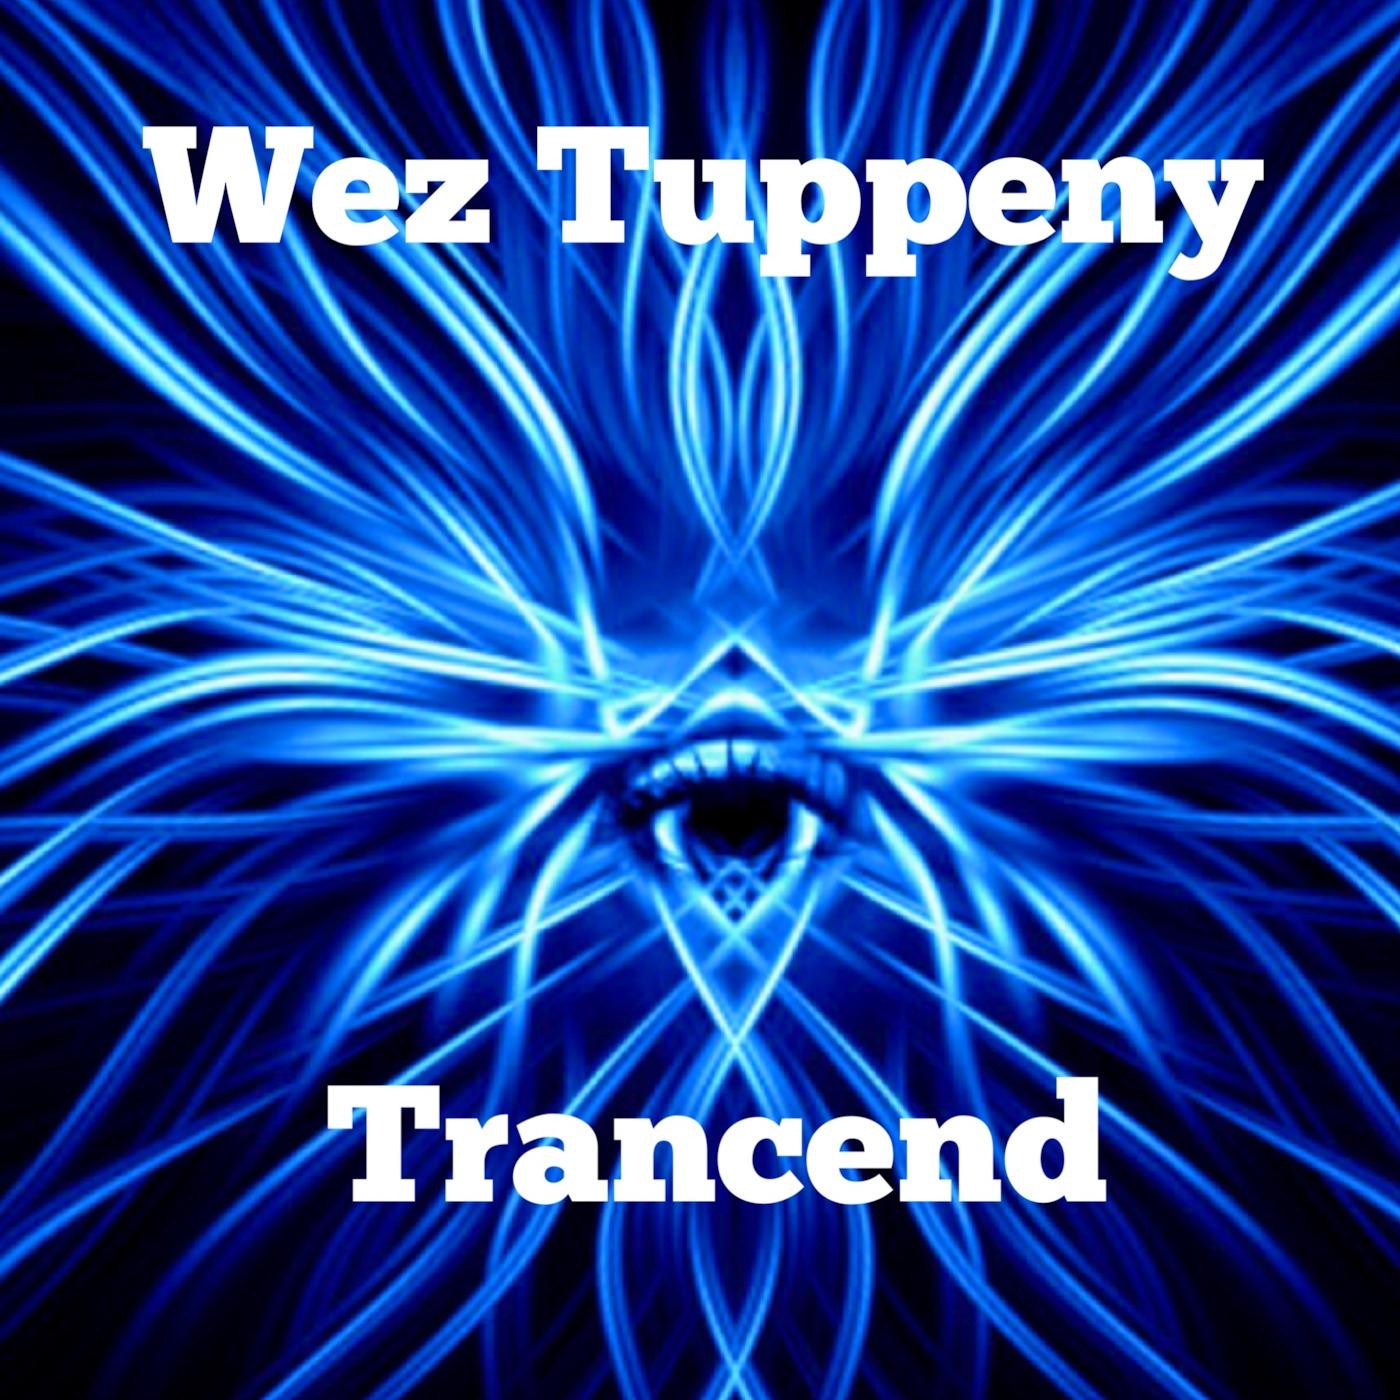 Wez Tuppeny Trancend